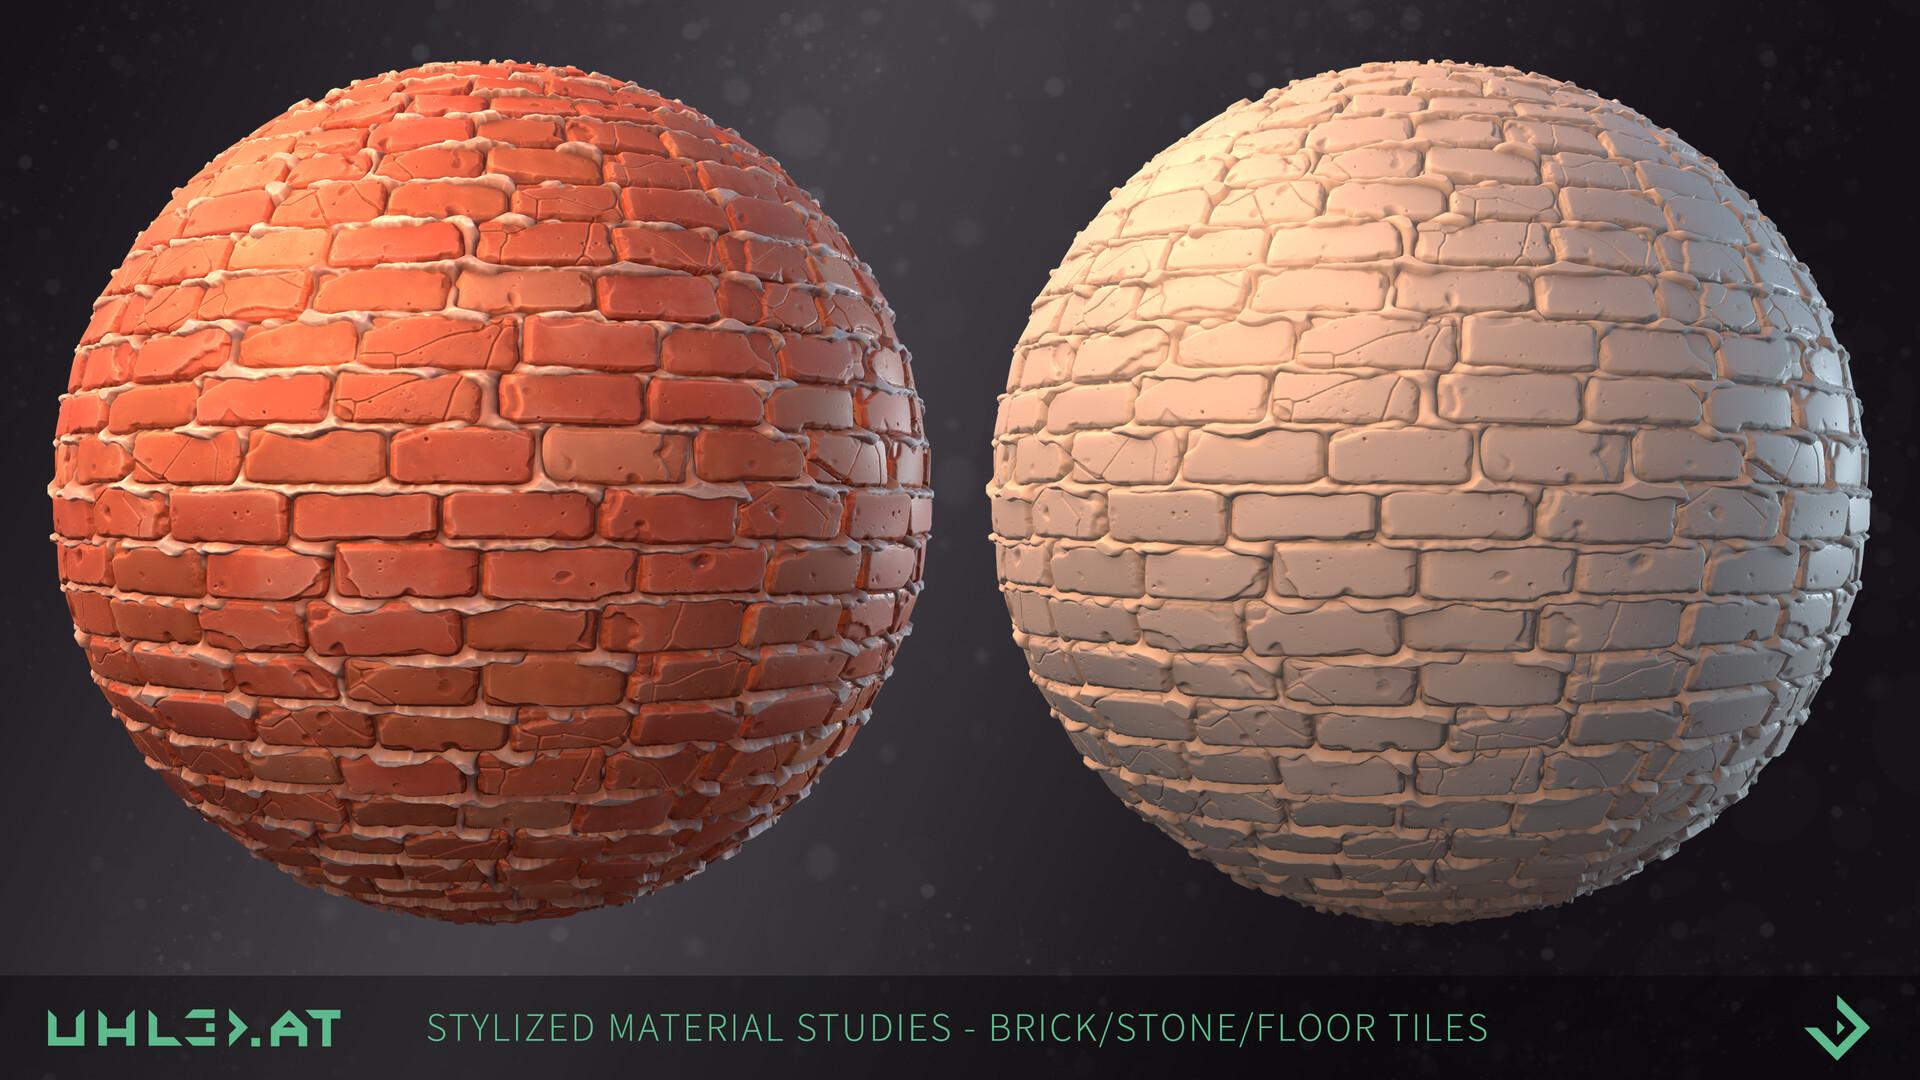 Dominik uhl stylized brick stone studies 06